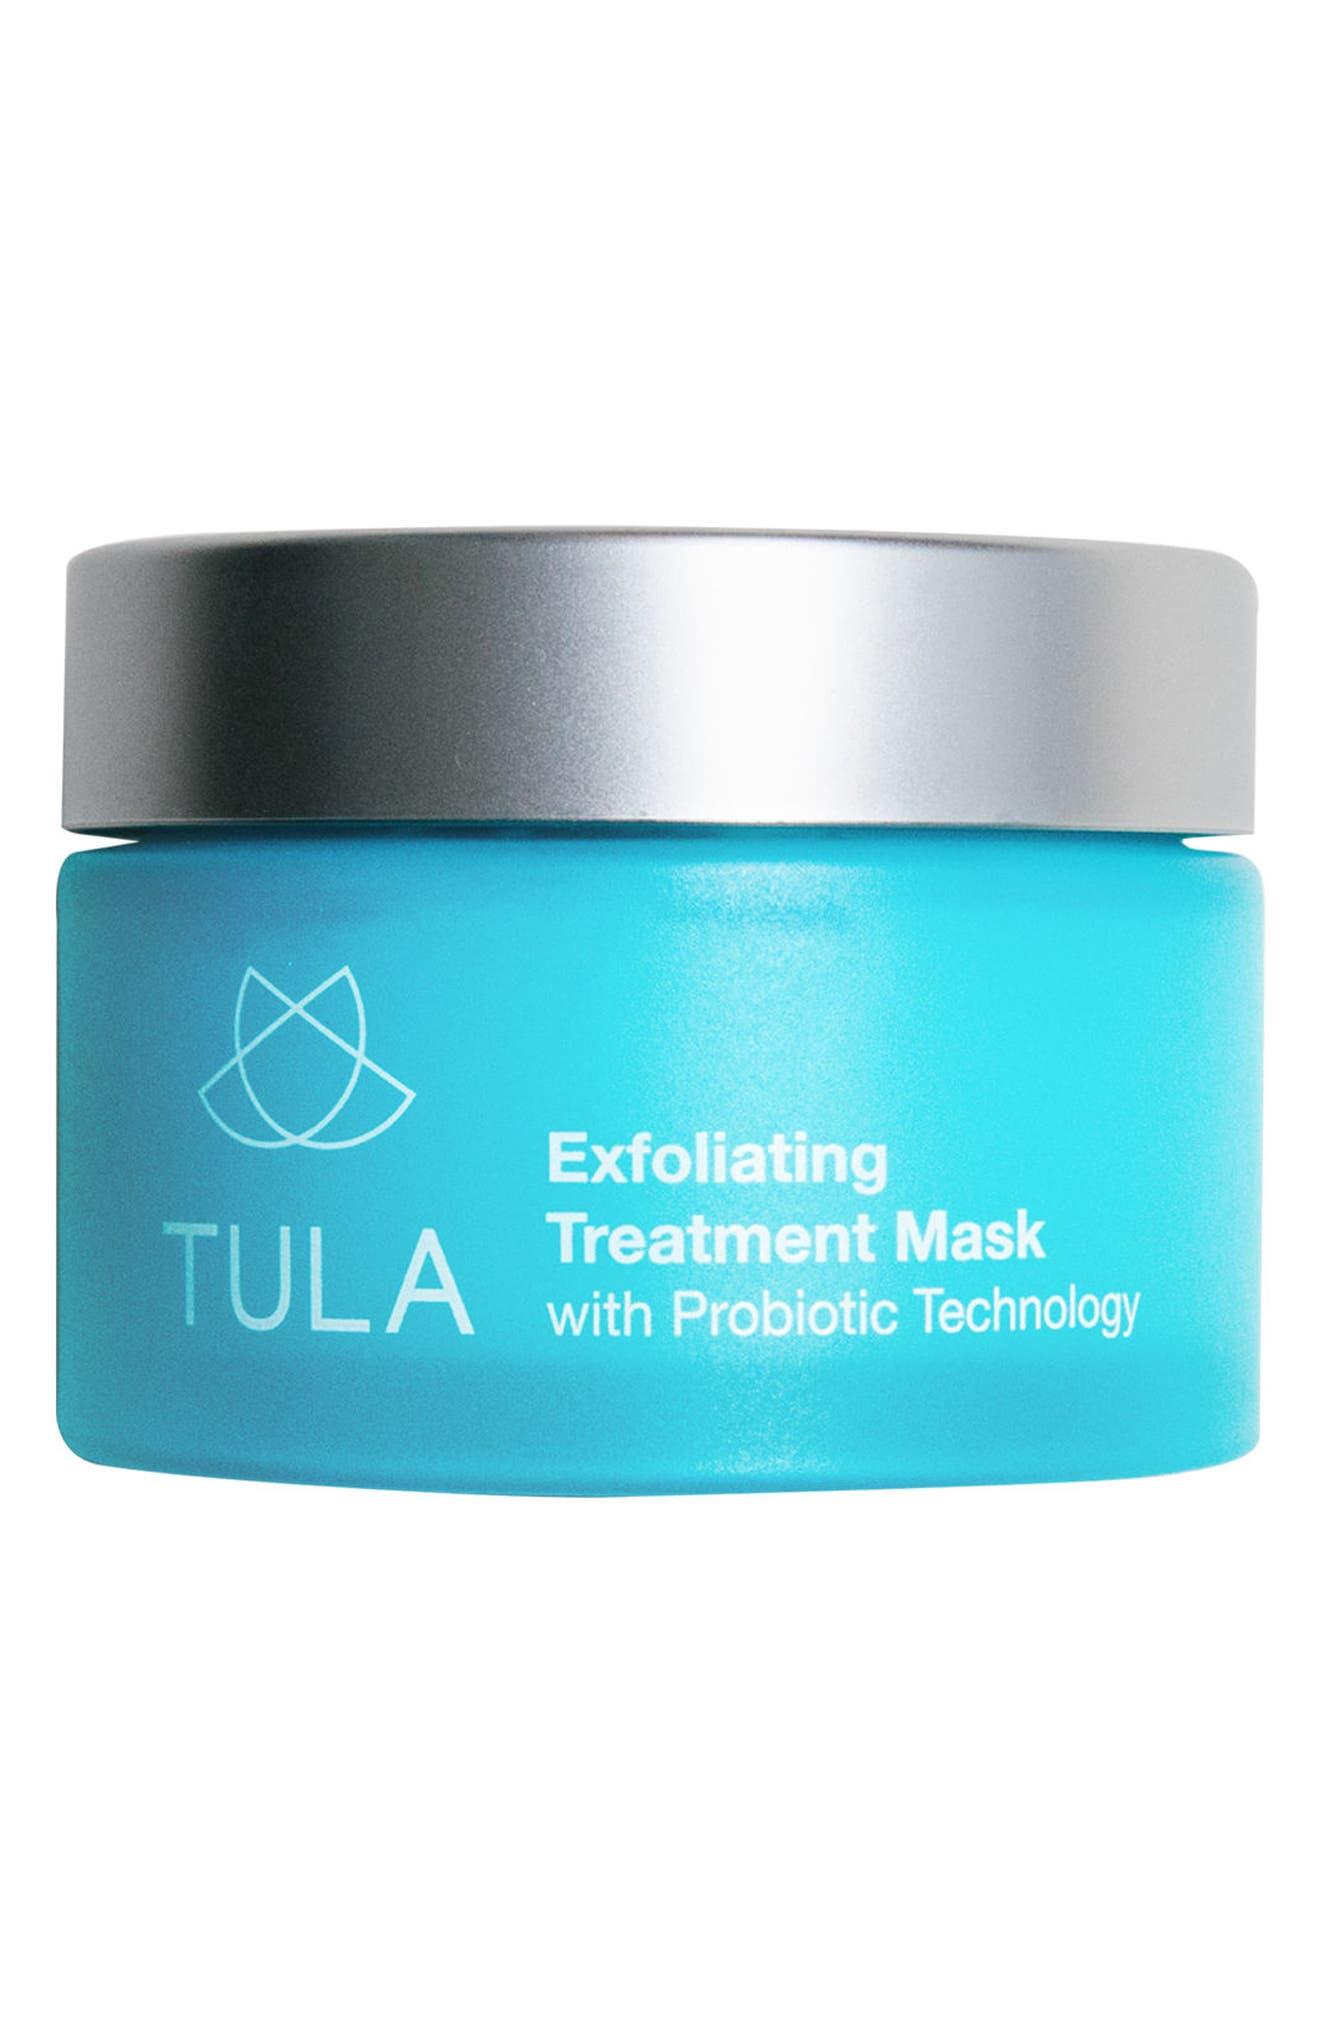 Exfoliating Treatment Mask,                             Main thumbnail 1, color,                             NO COLOR